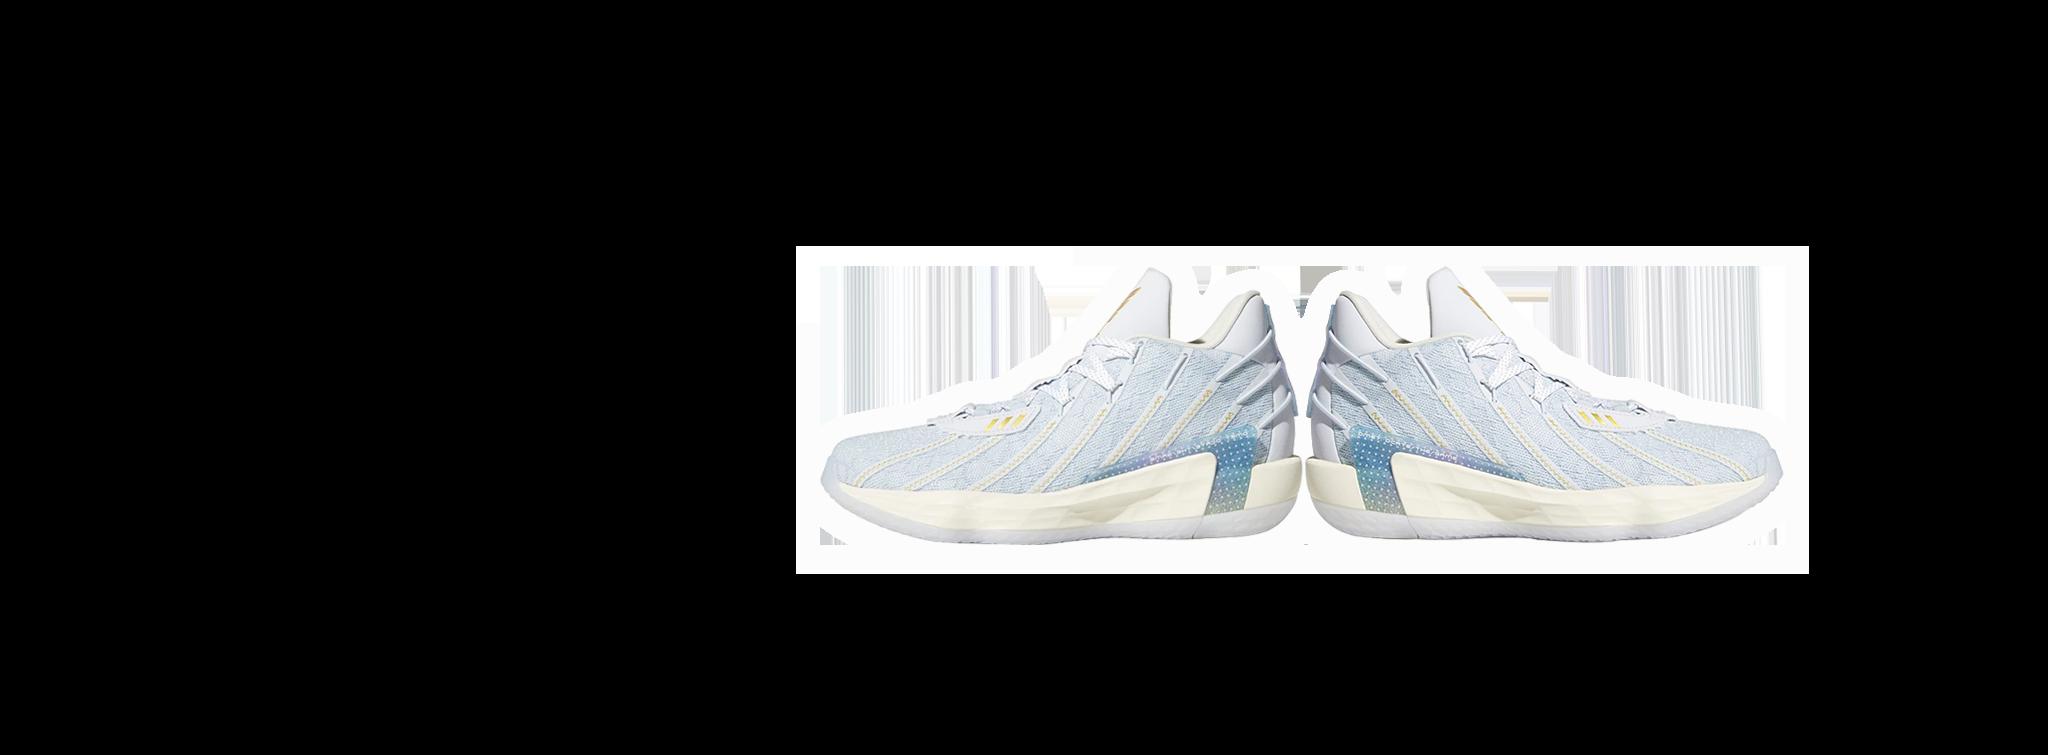 scarpe-11